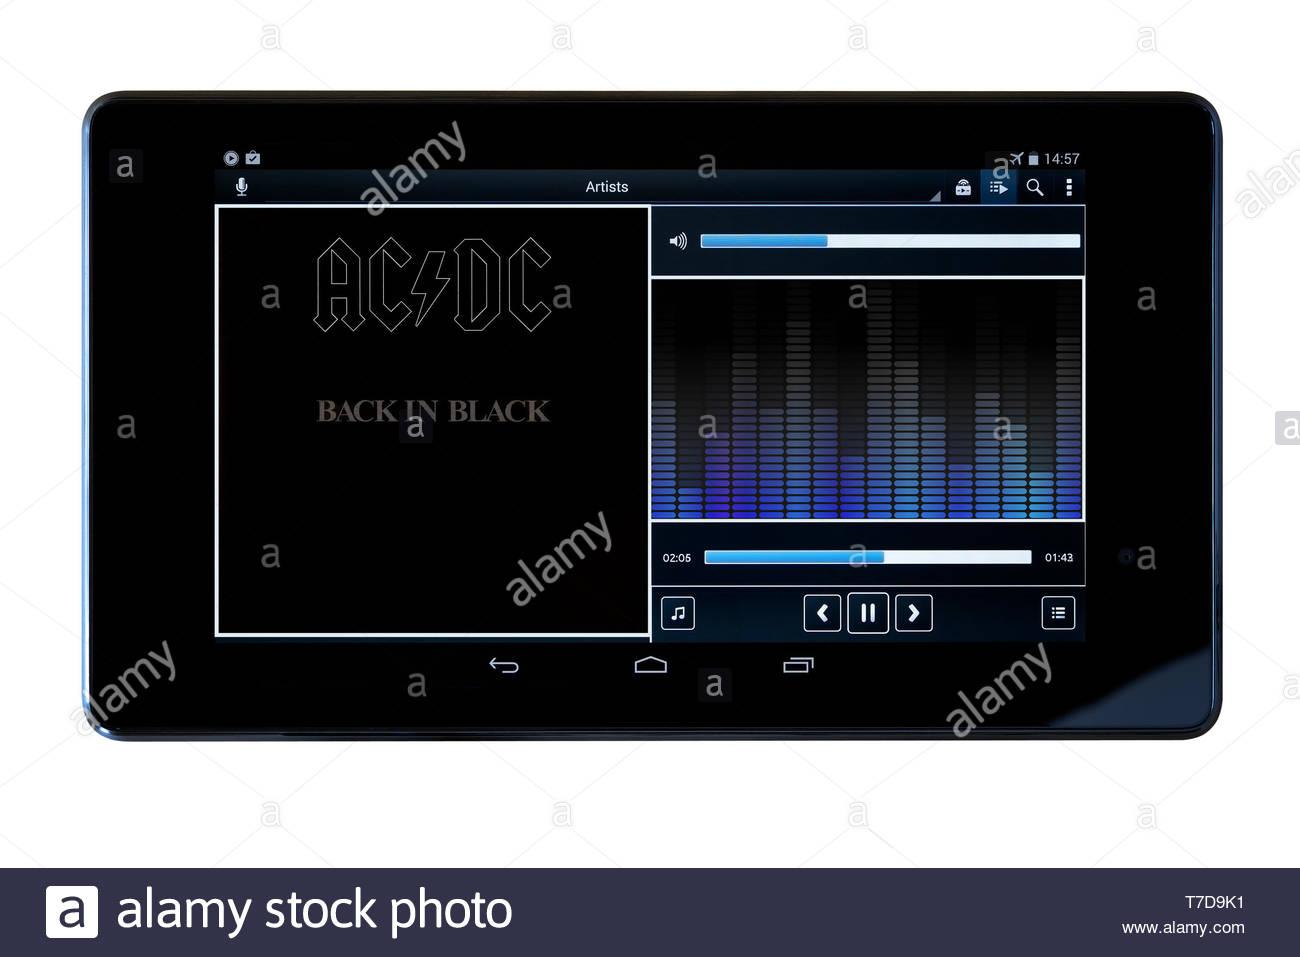 Ac Dc Back In Black Mp3 Album Art Auf Pc Tablet England Stockfotografie Alamy